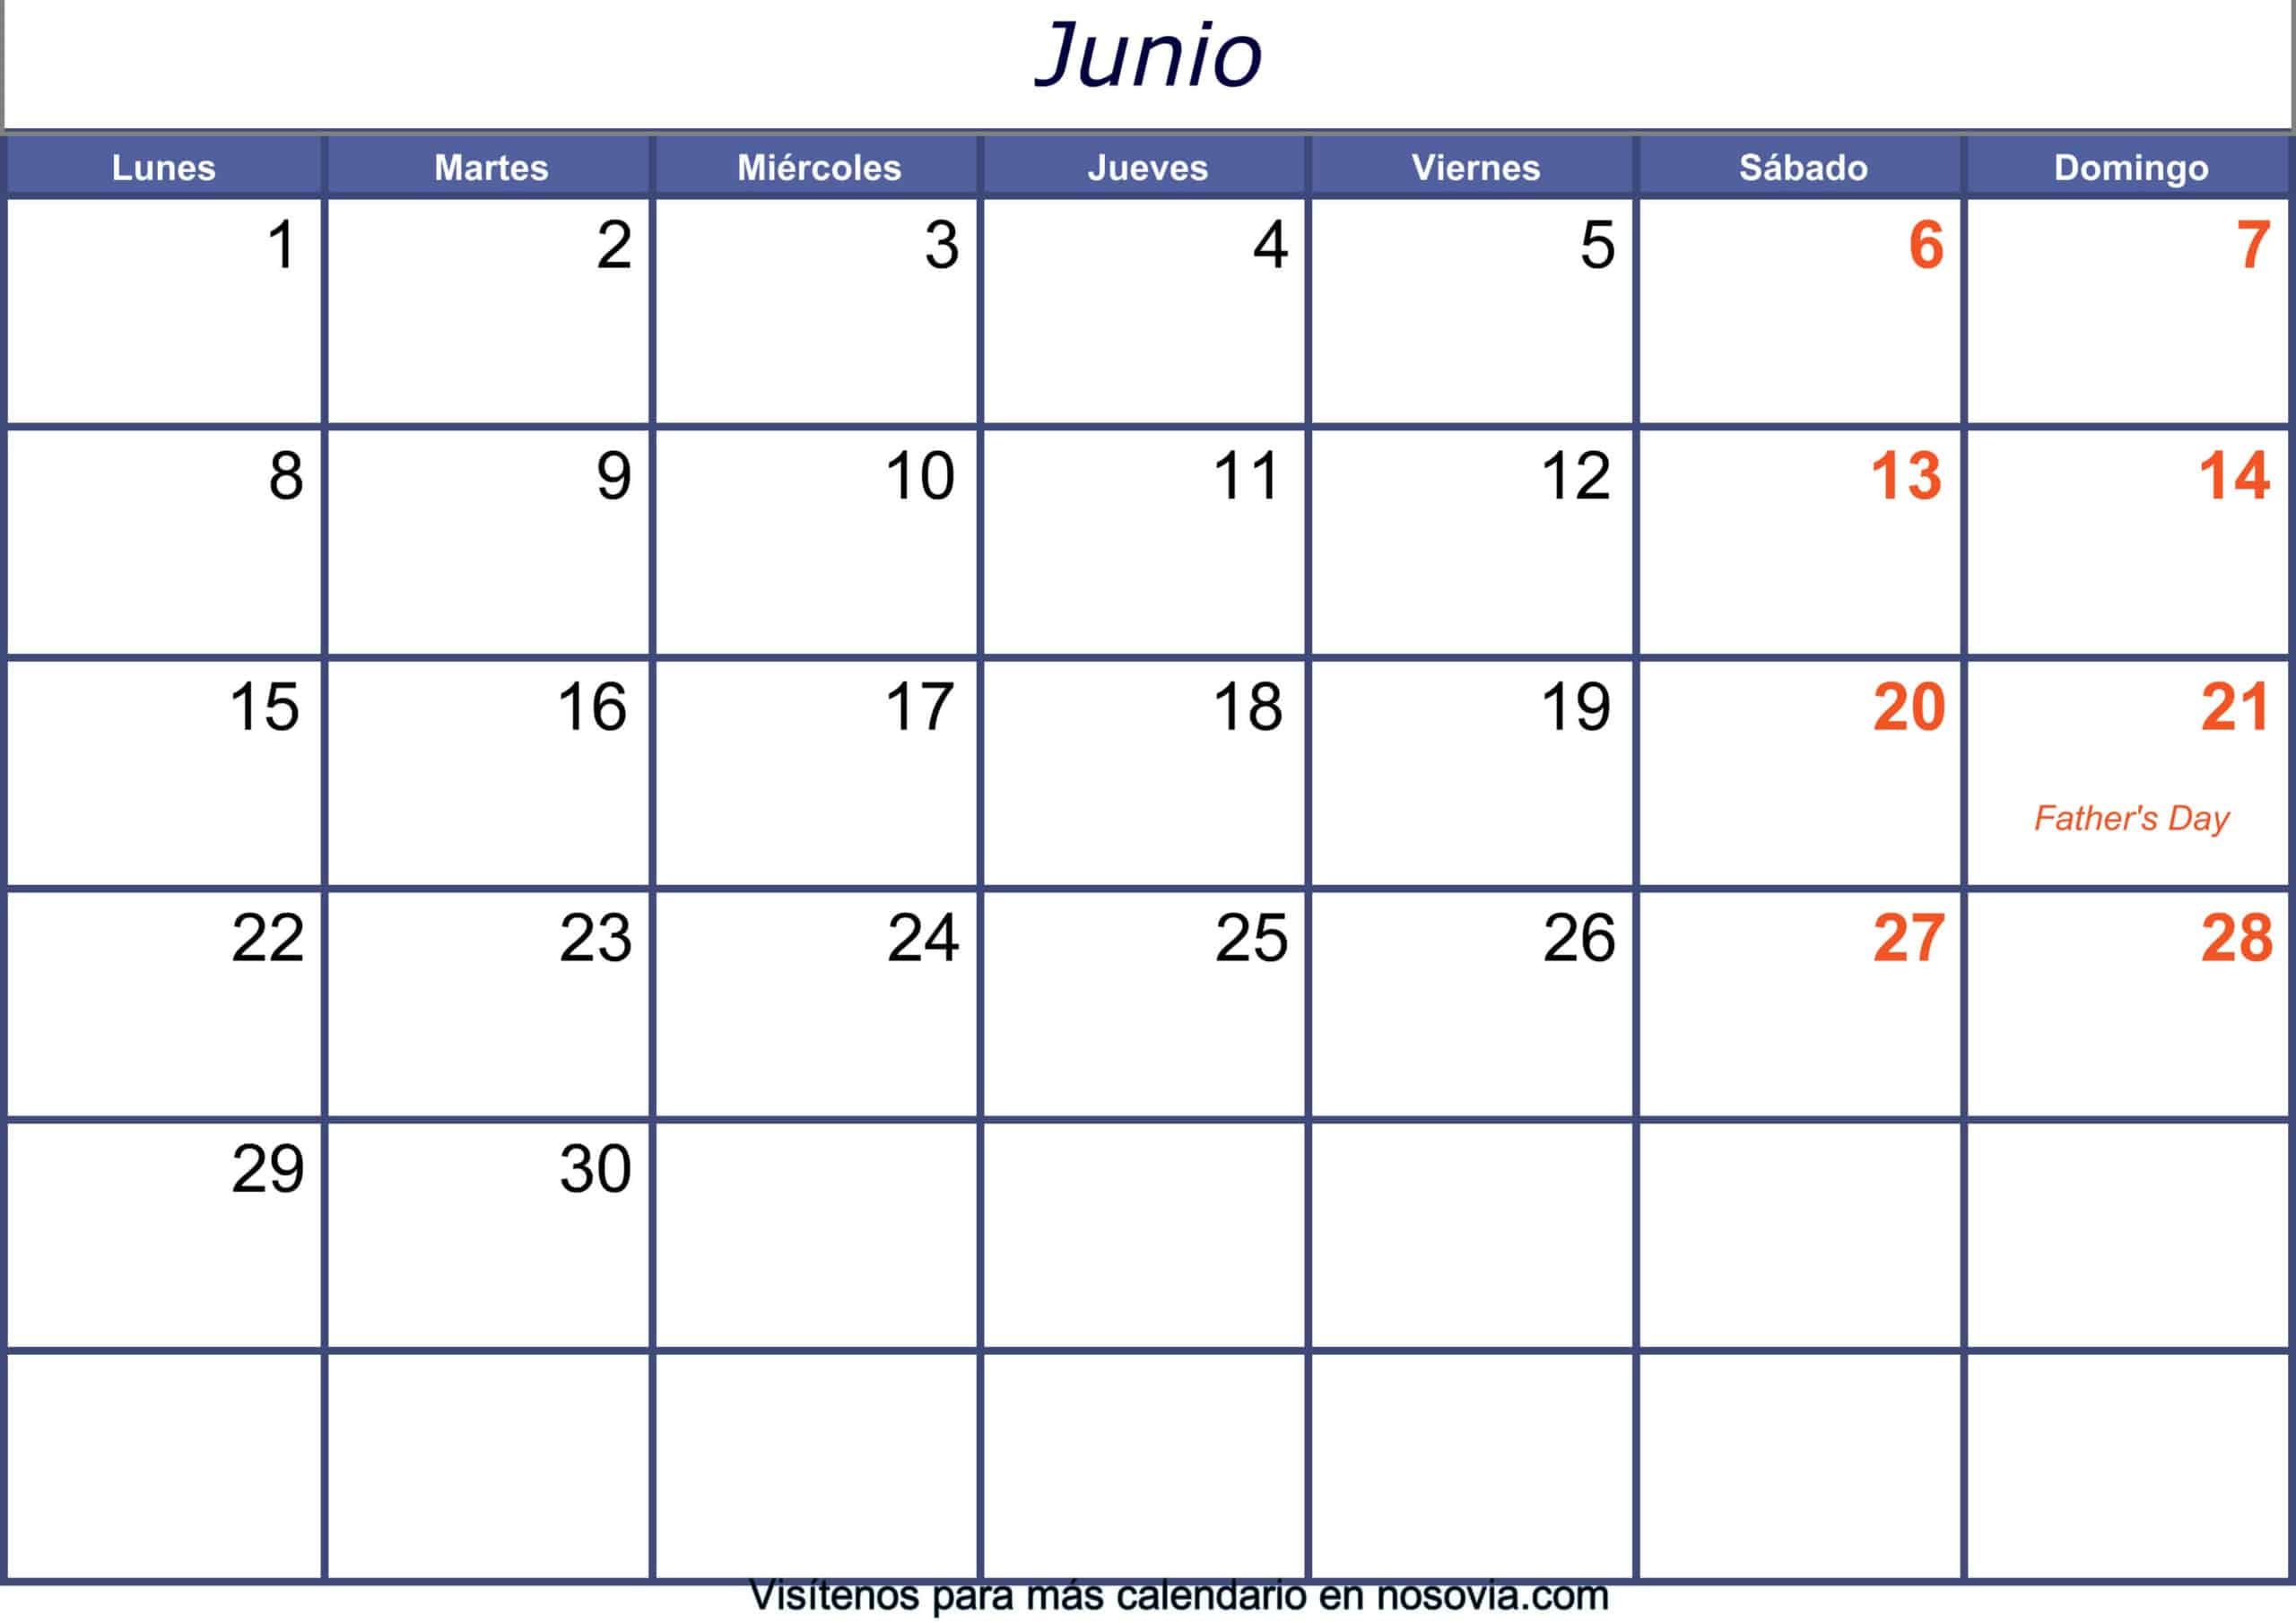 Calendario-junio-2020-con-festivos-para-imprimir